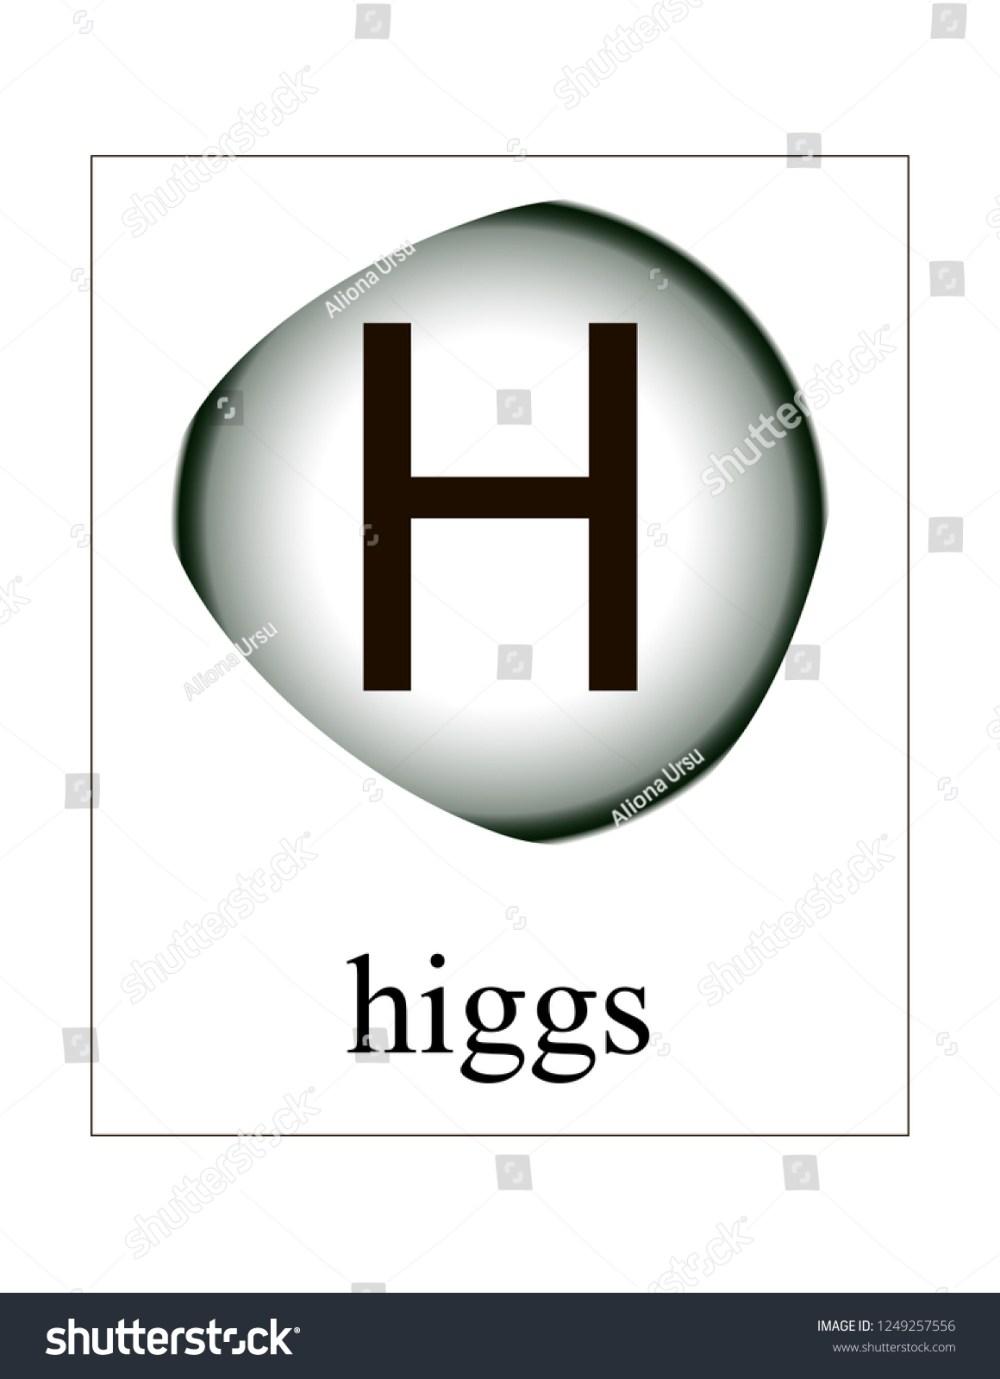 medium resolution of higgs boson vector illustration quantum mechanics elementary particles